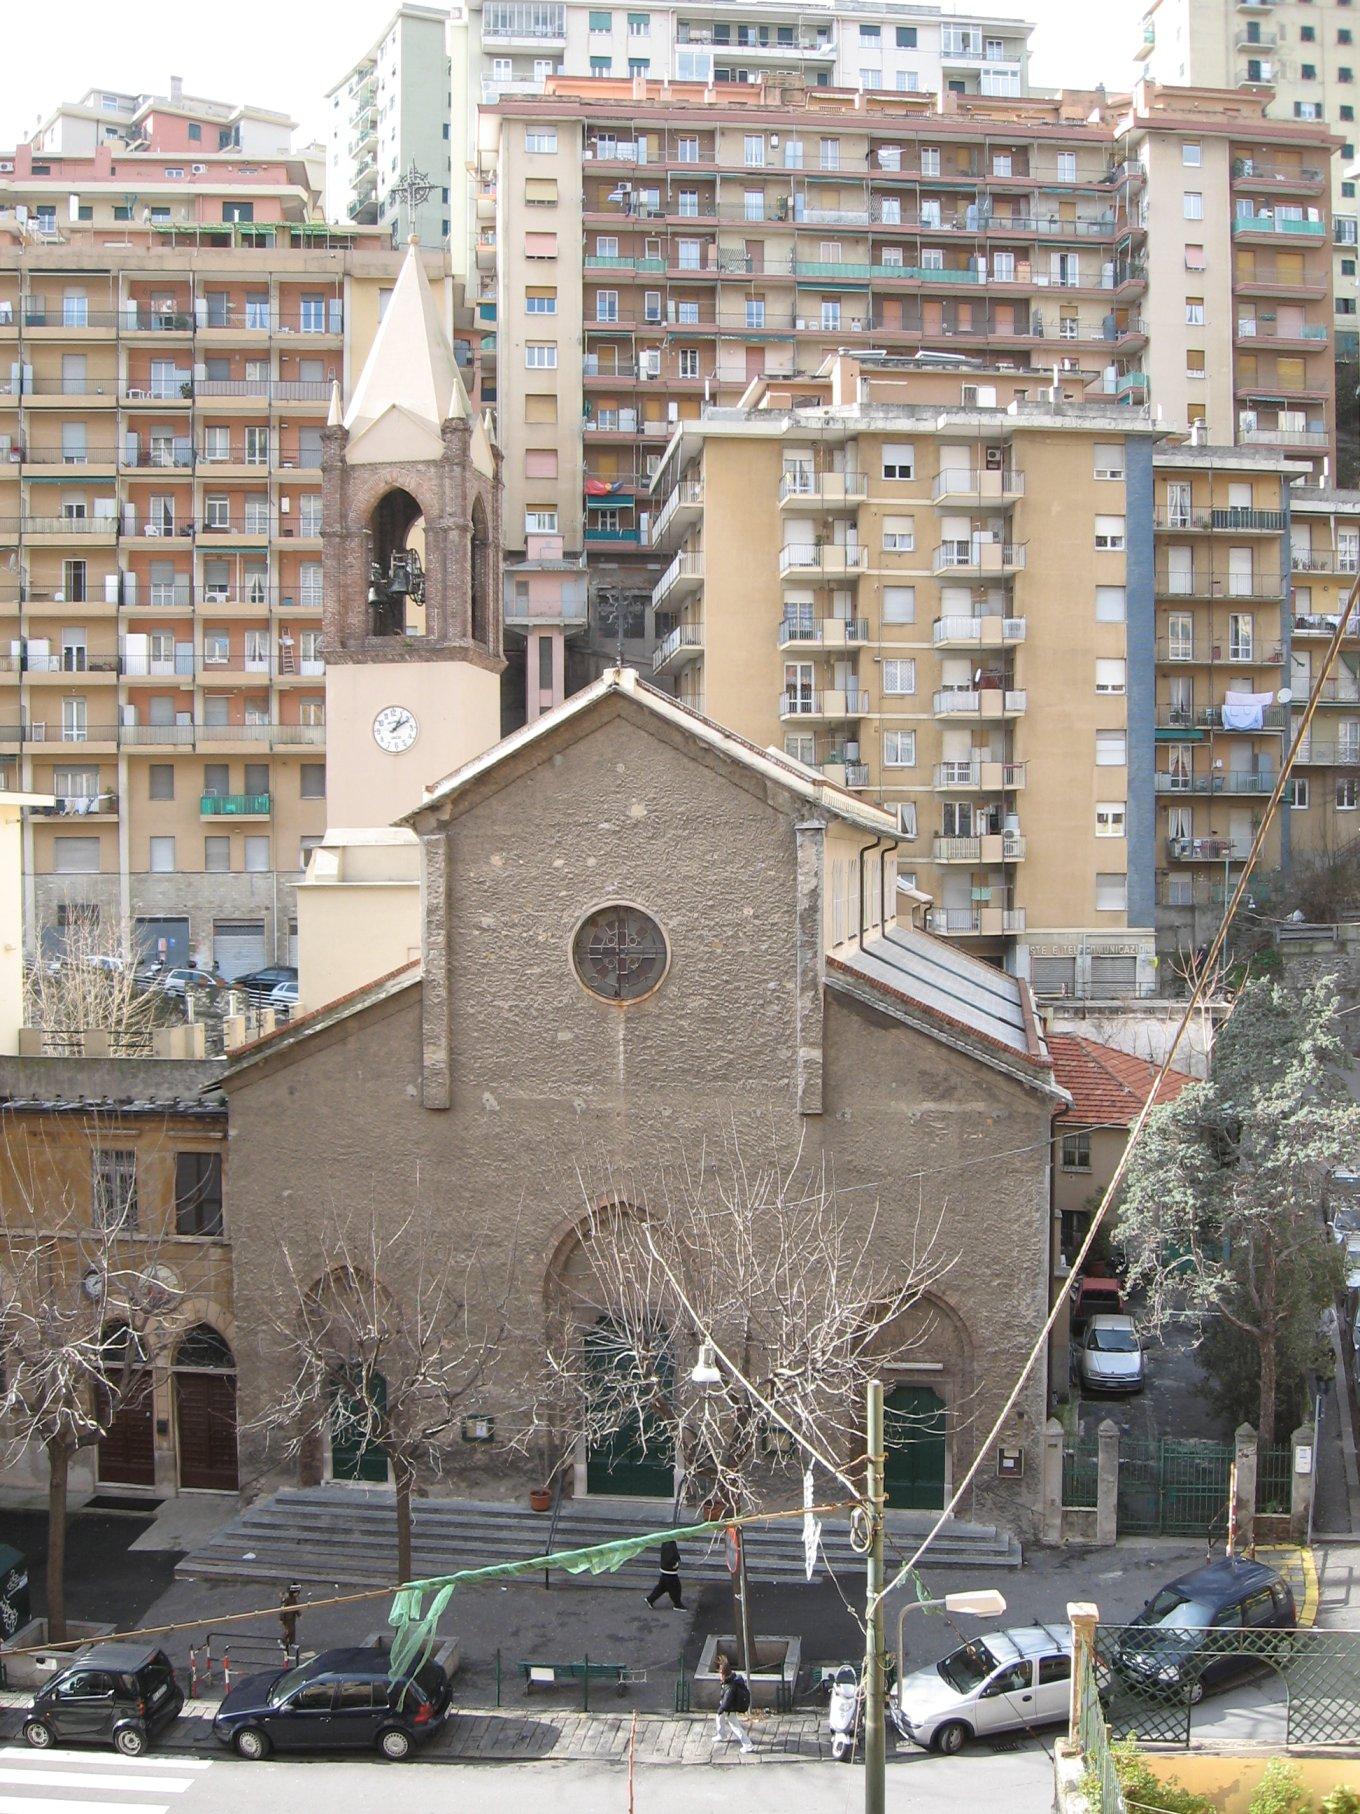 Chiesa_esterno-2009-01-27-13.10.33.jpg